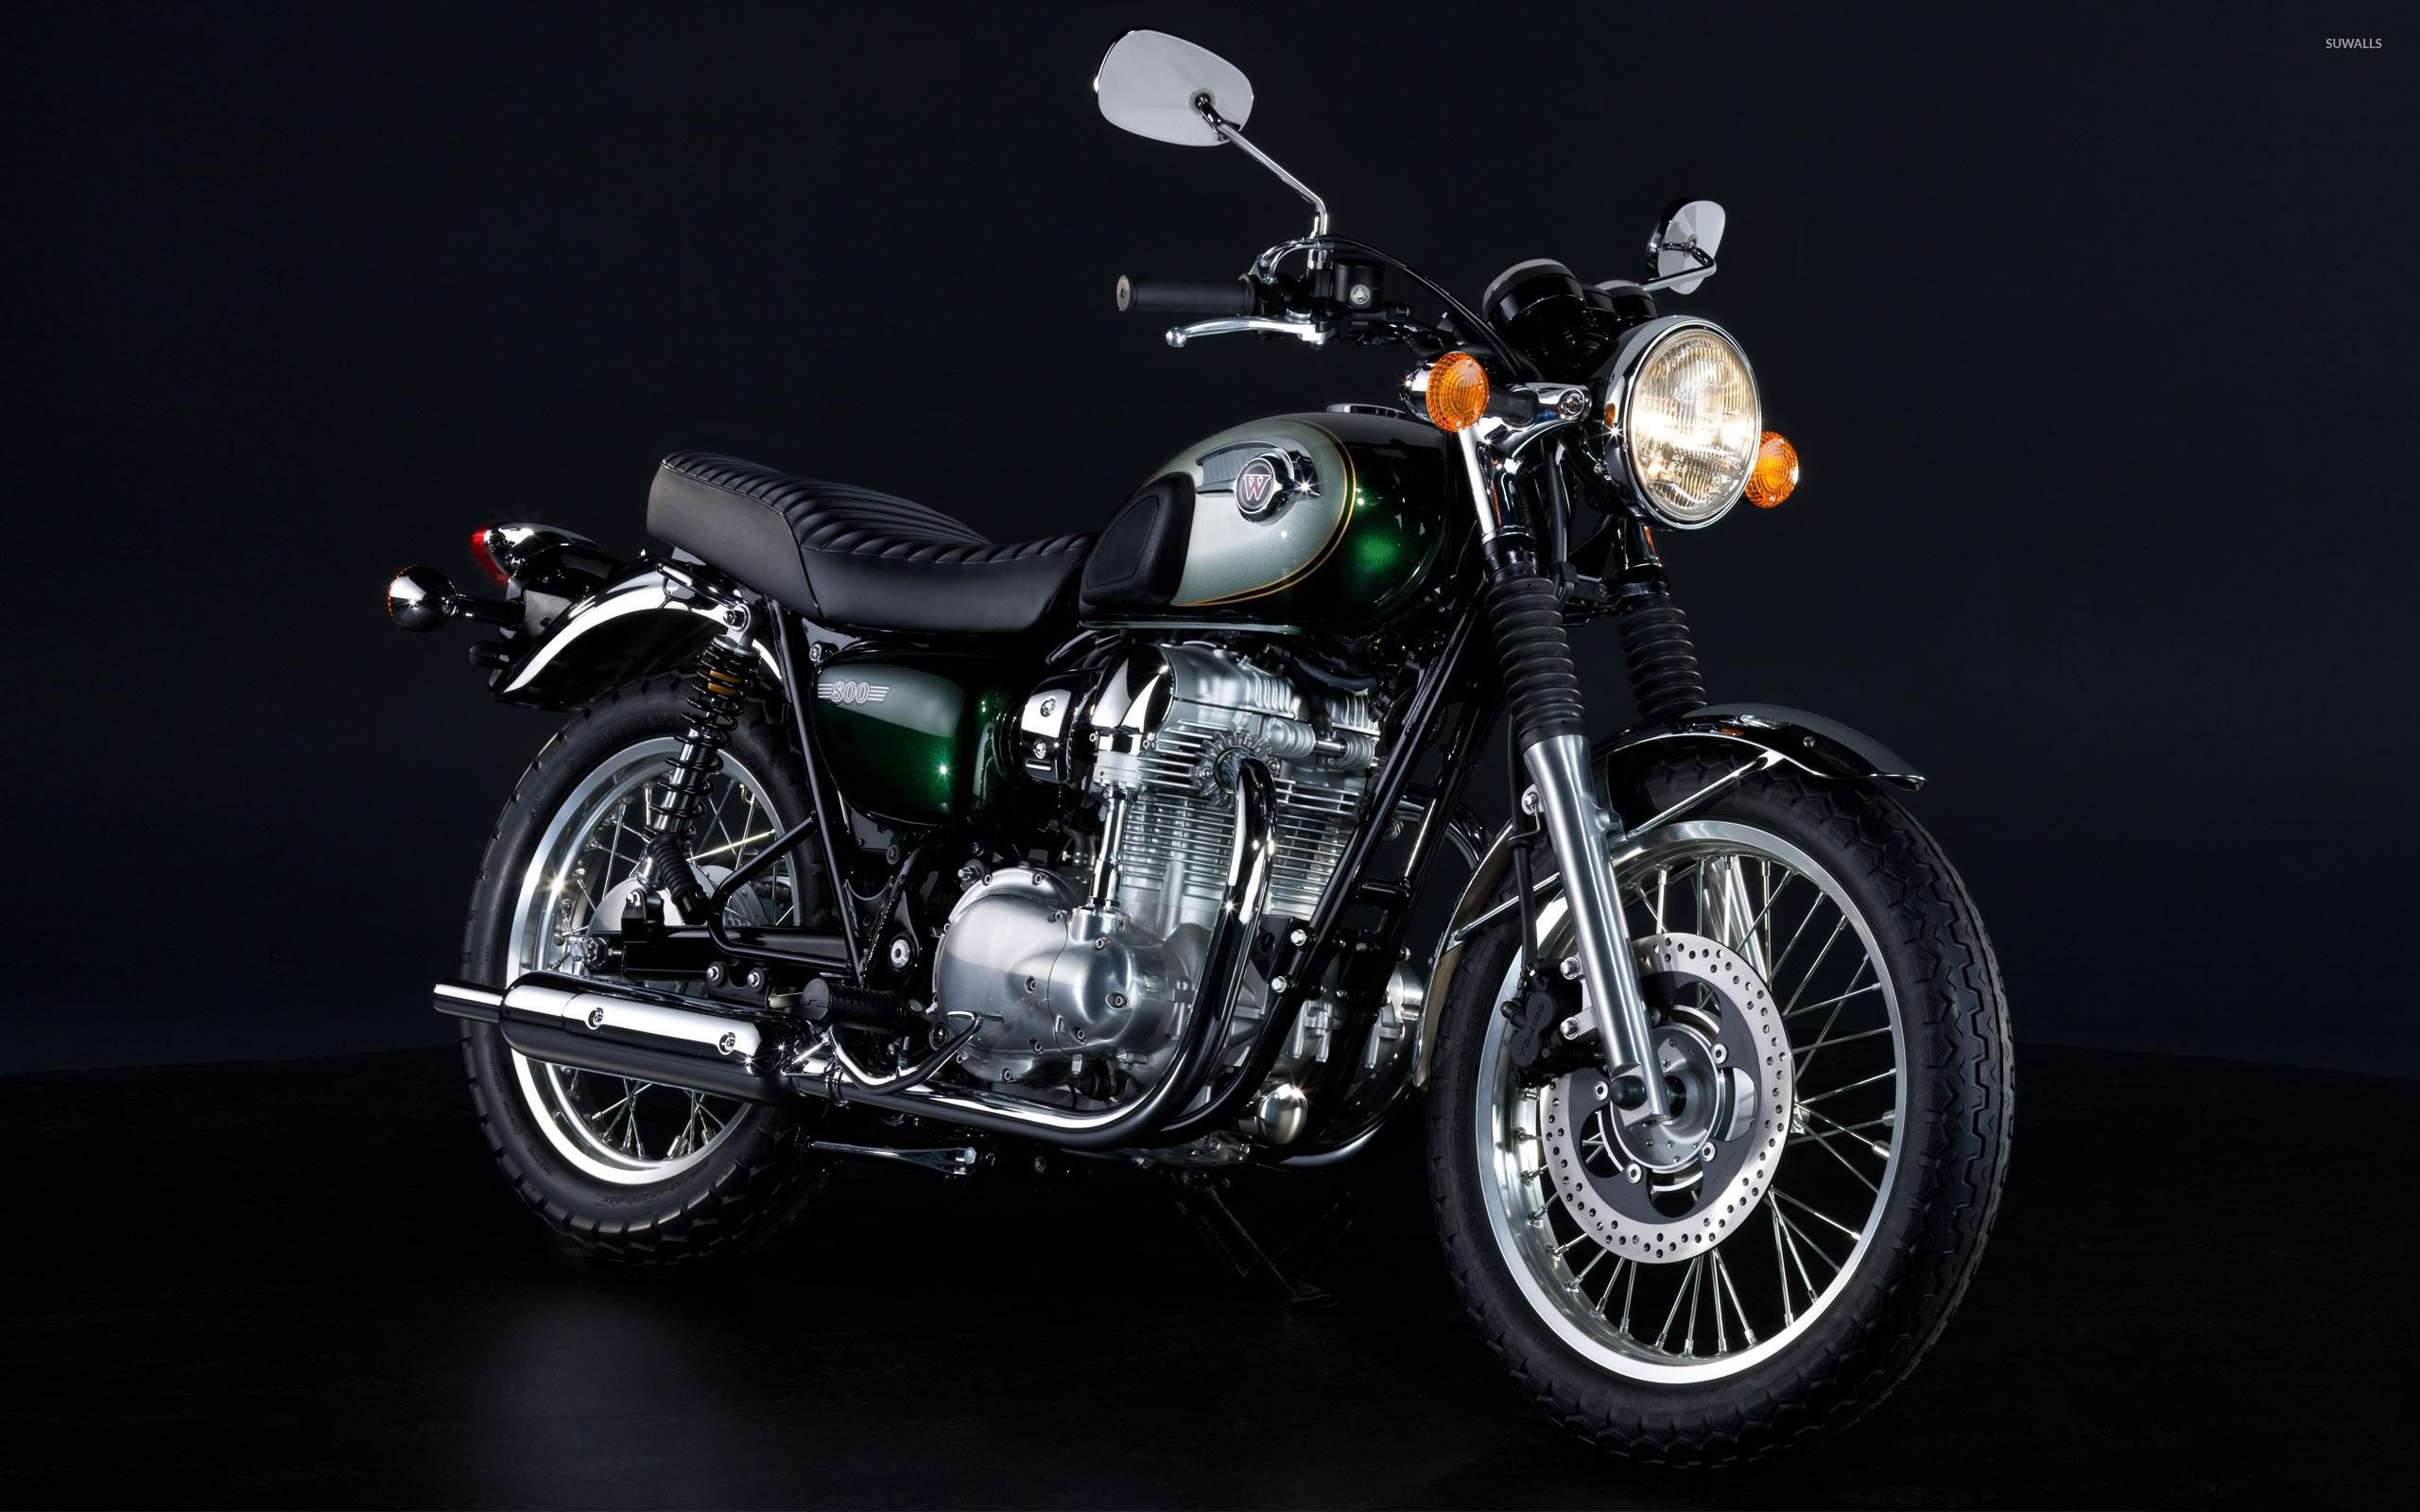 Black Kawasaki W800 Side View Wallpaper Motorcycle Wallpapers 47409